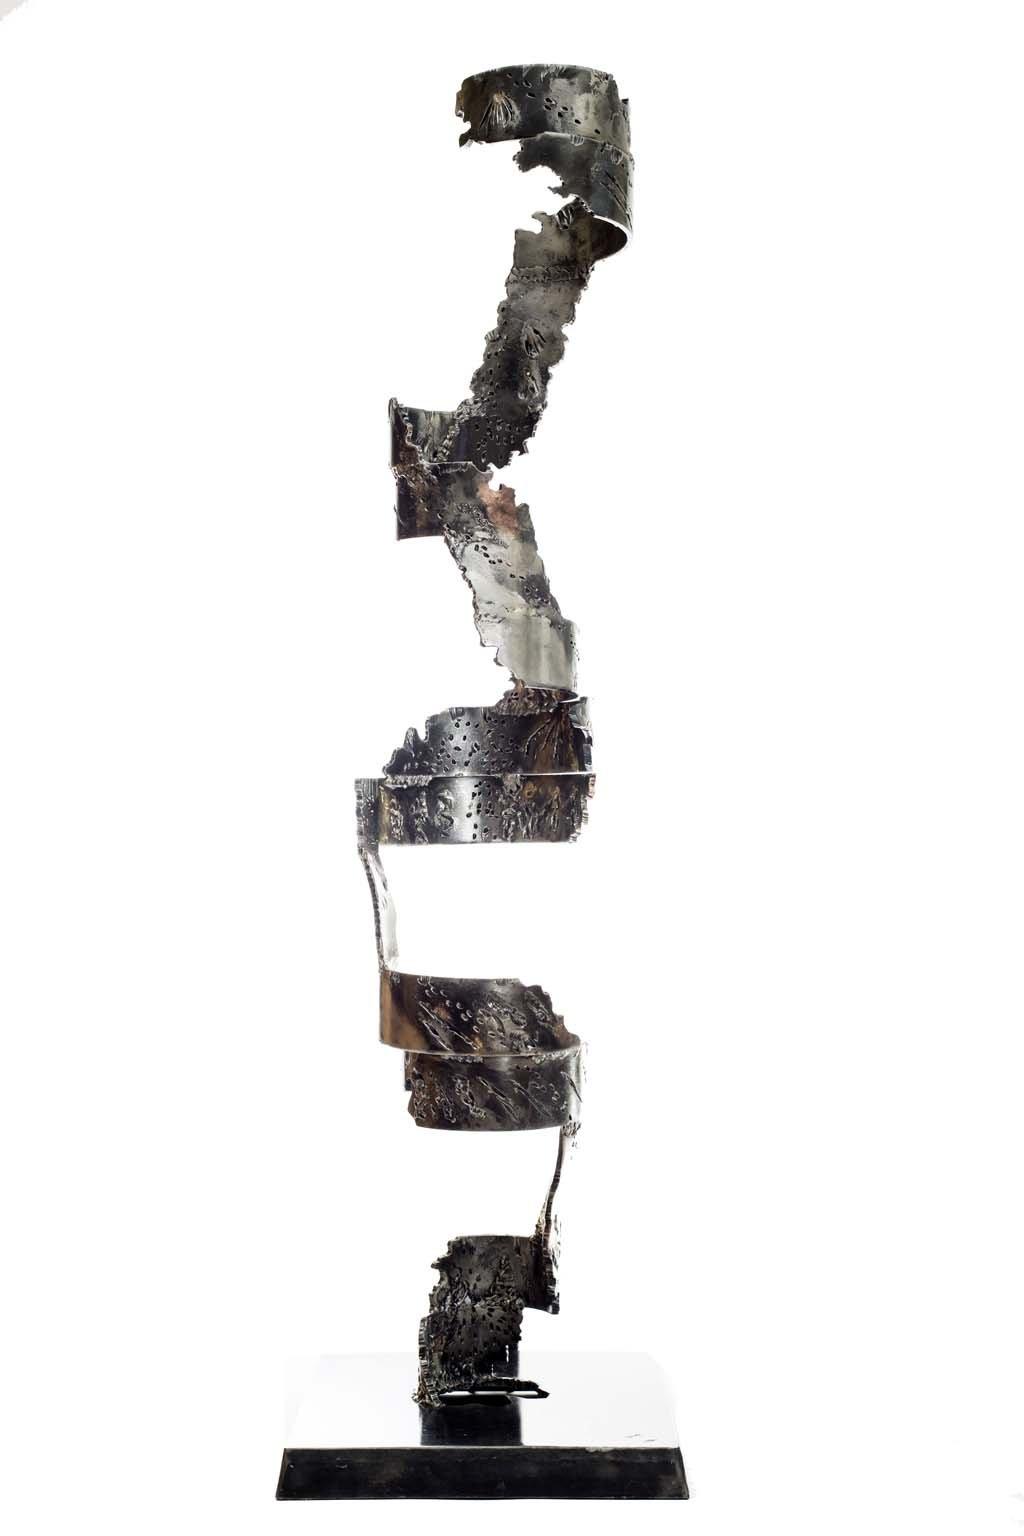 Insights IV | 2013 | Iron & brass sculpture of the Israeli artist, sculptor Rami Ater